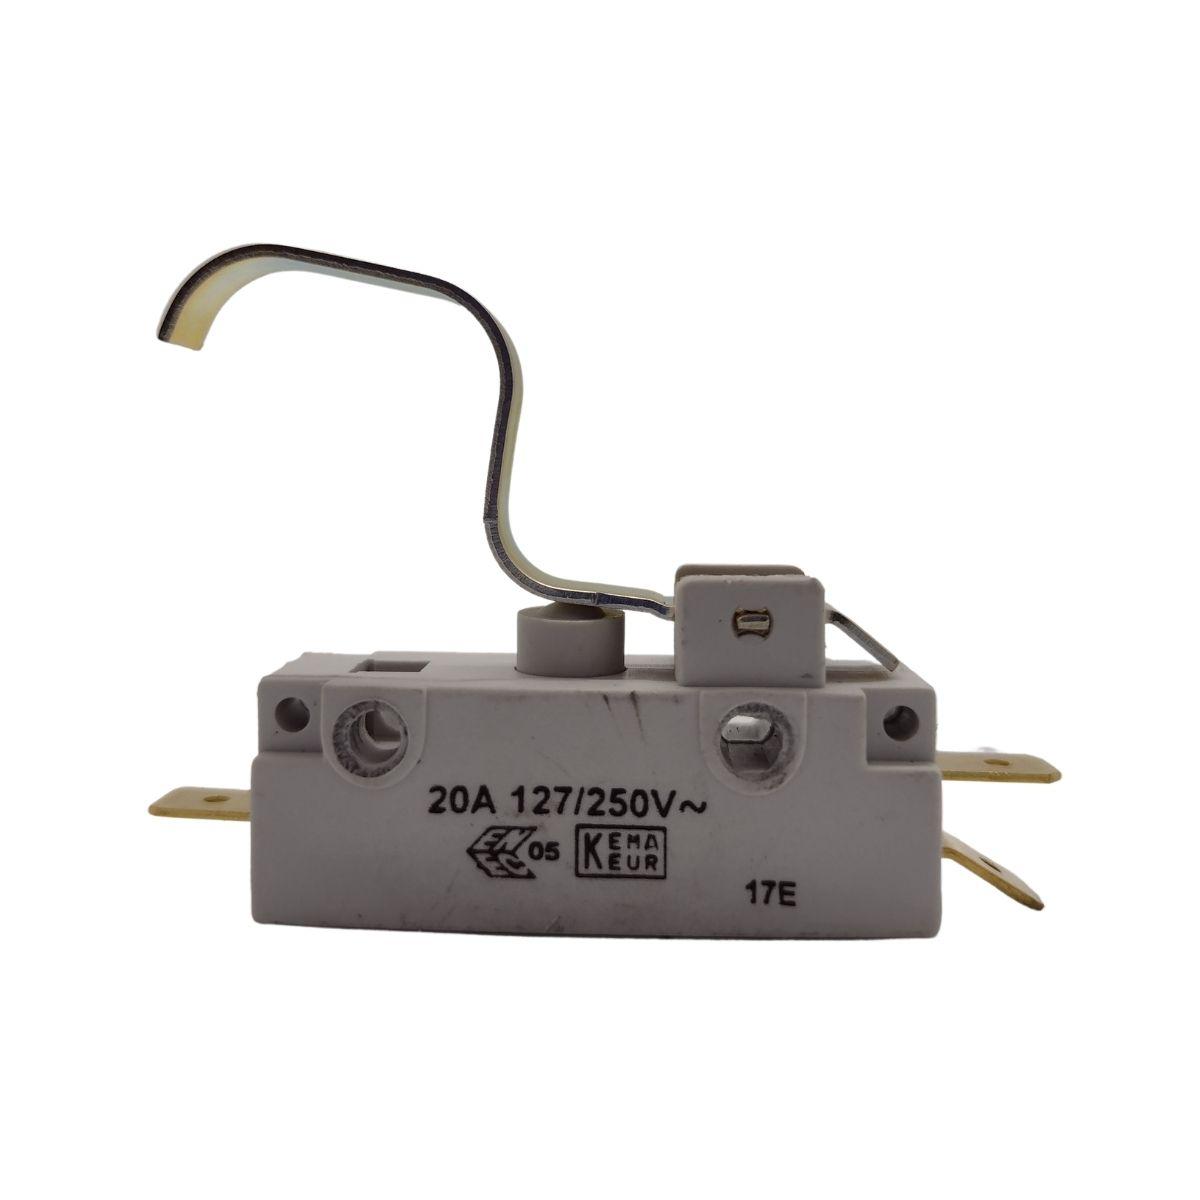 Micro Interruptor Original Para Motores Basculante